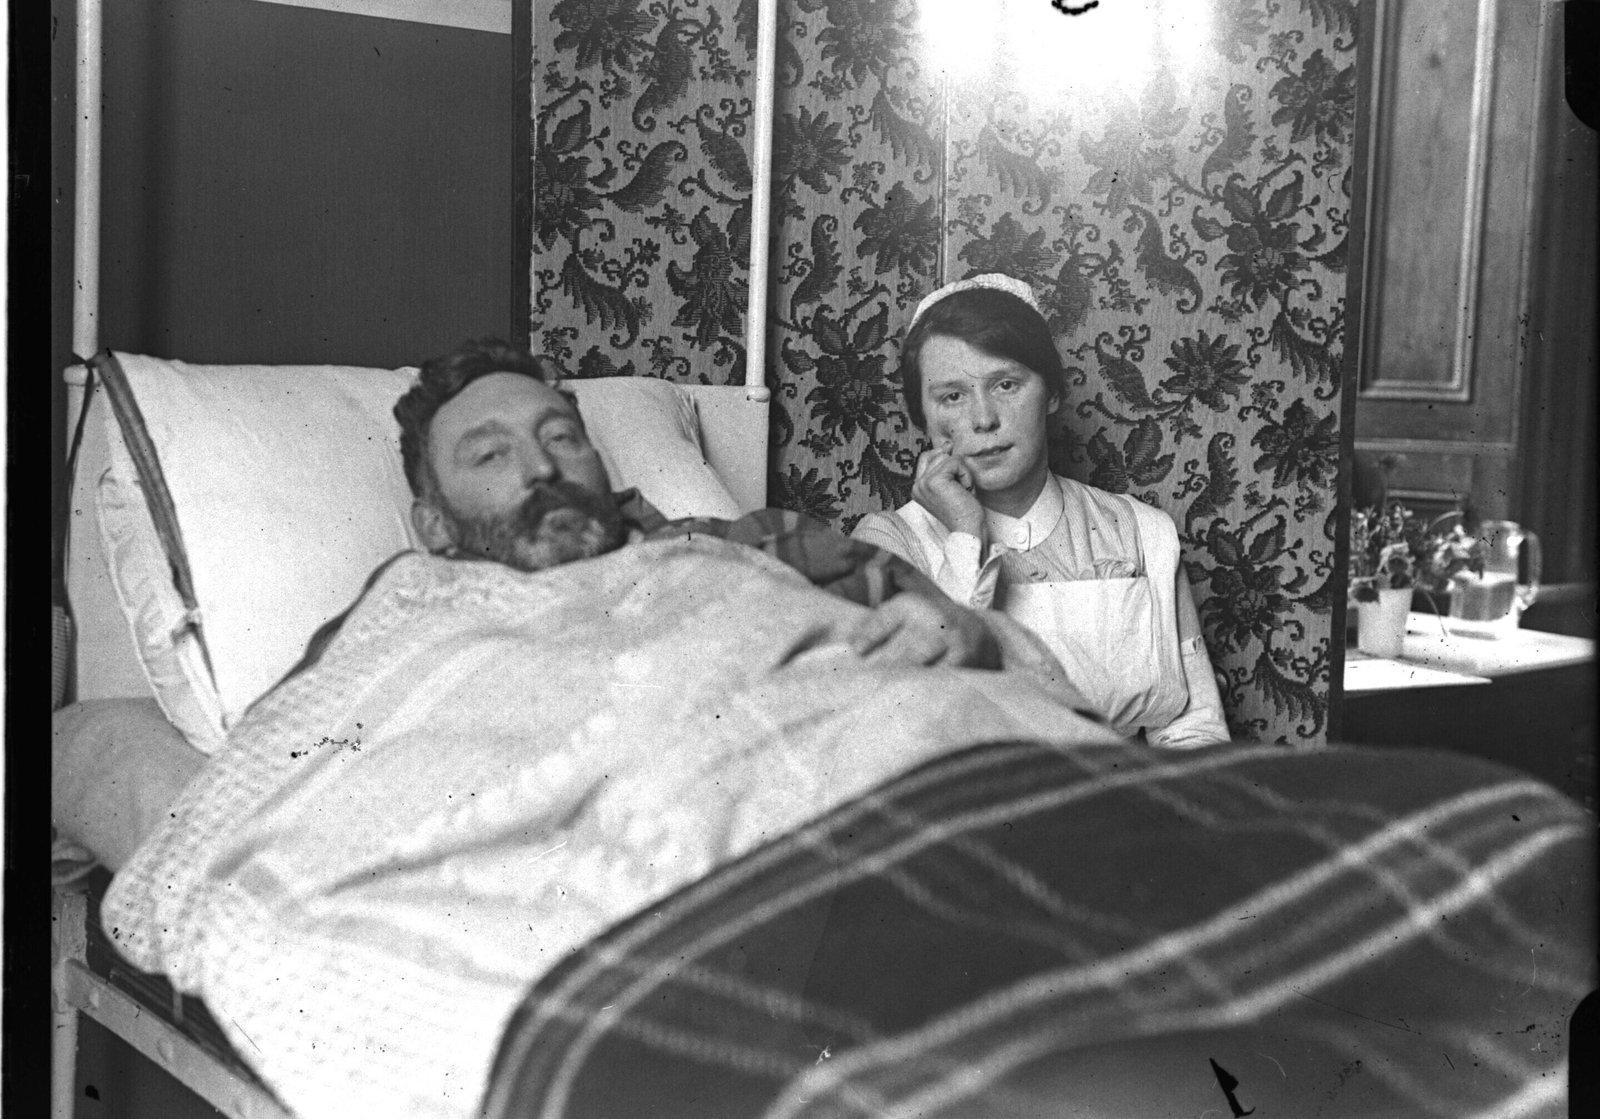 Image - © RTÉ Stills Library